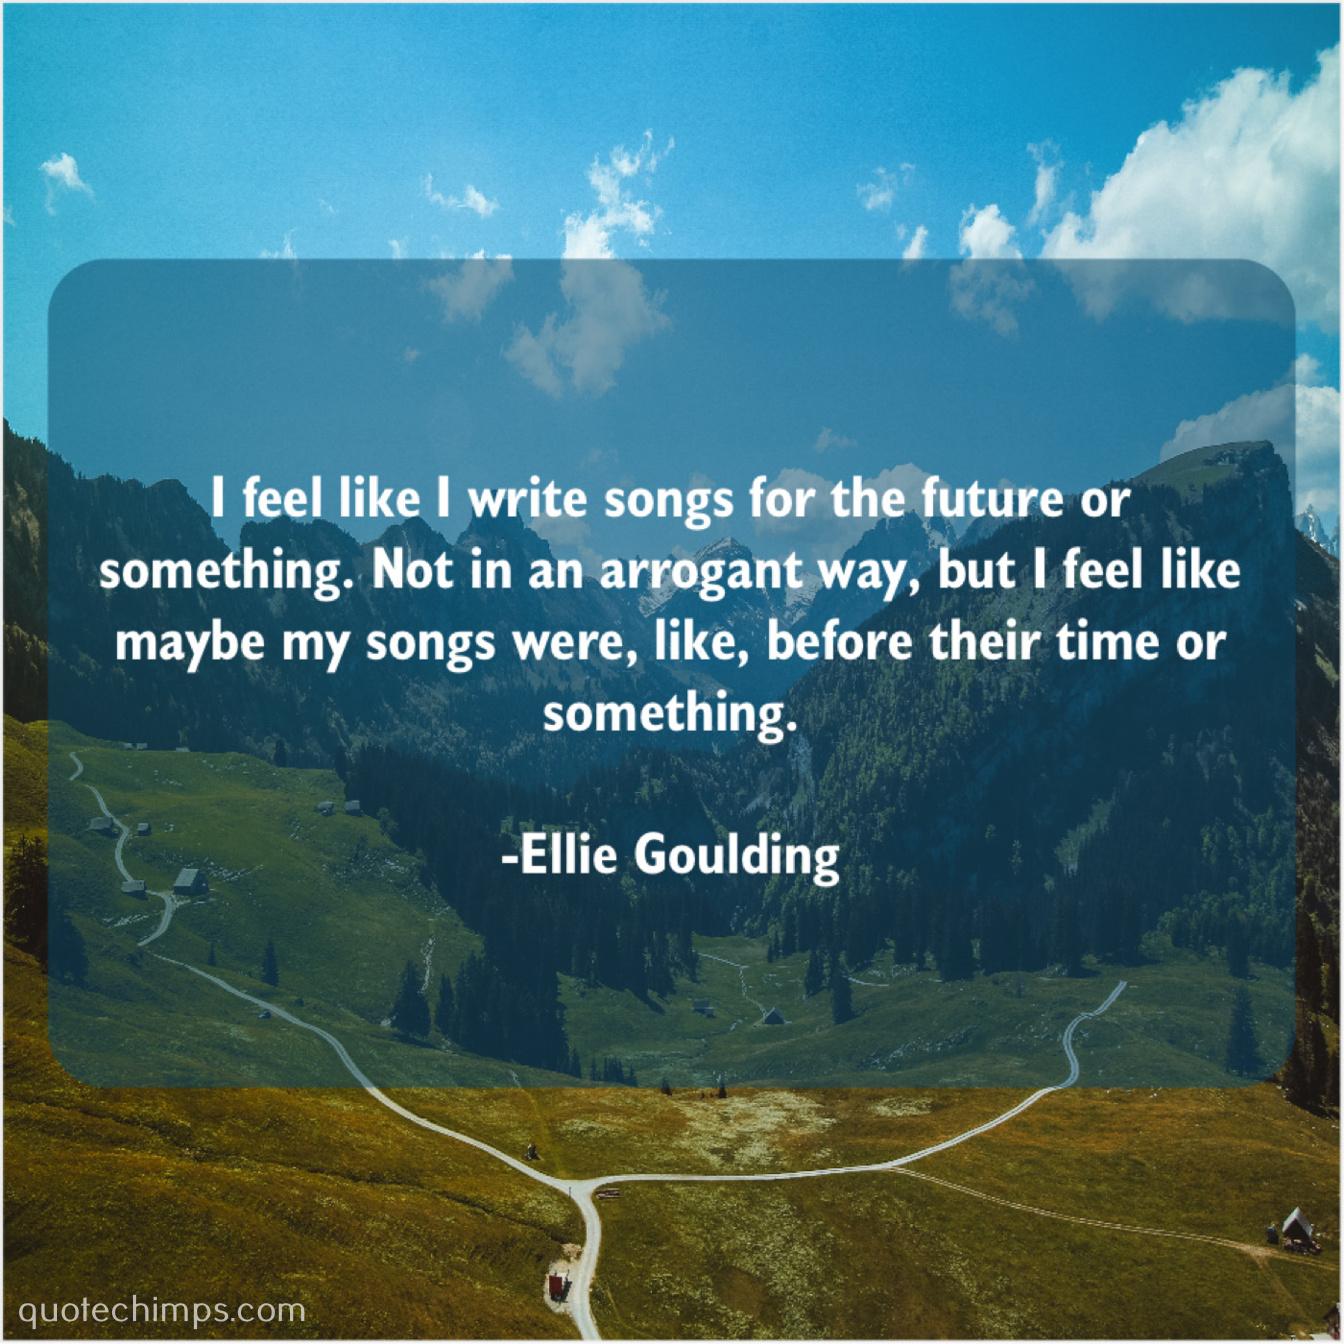 Ellie Goulding I Feel Like I Write